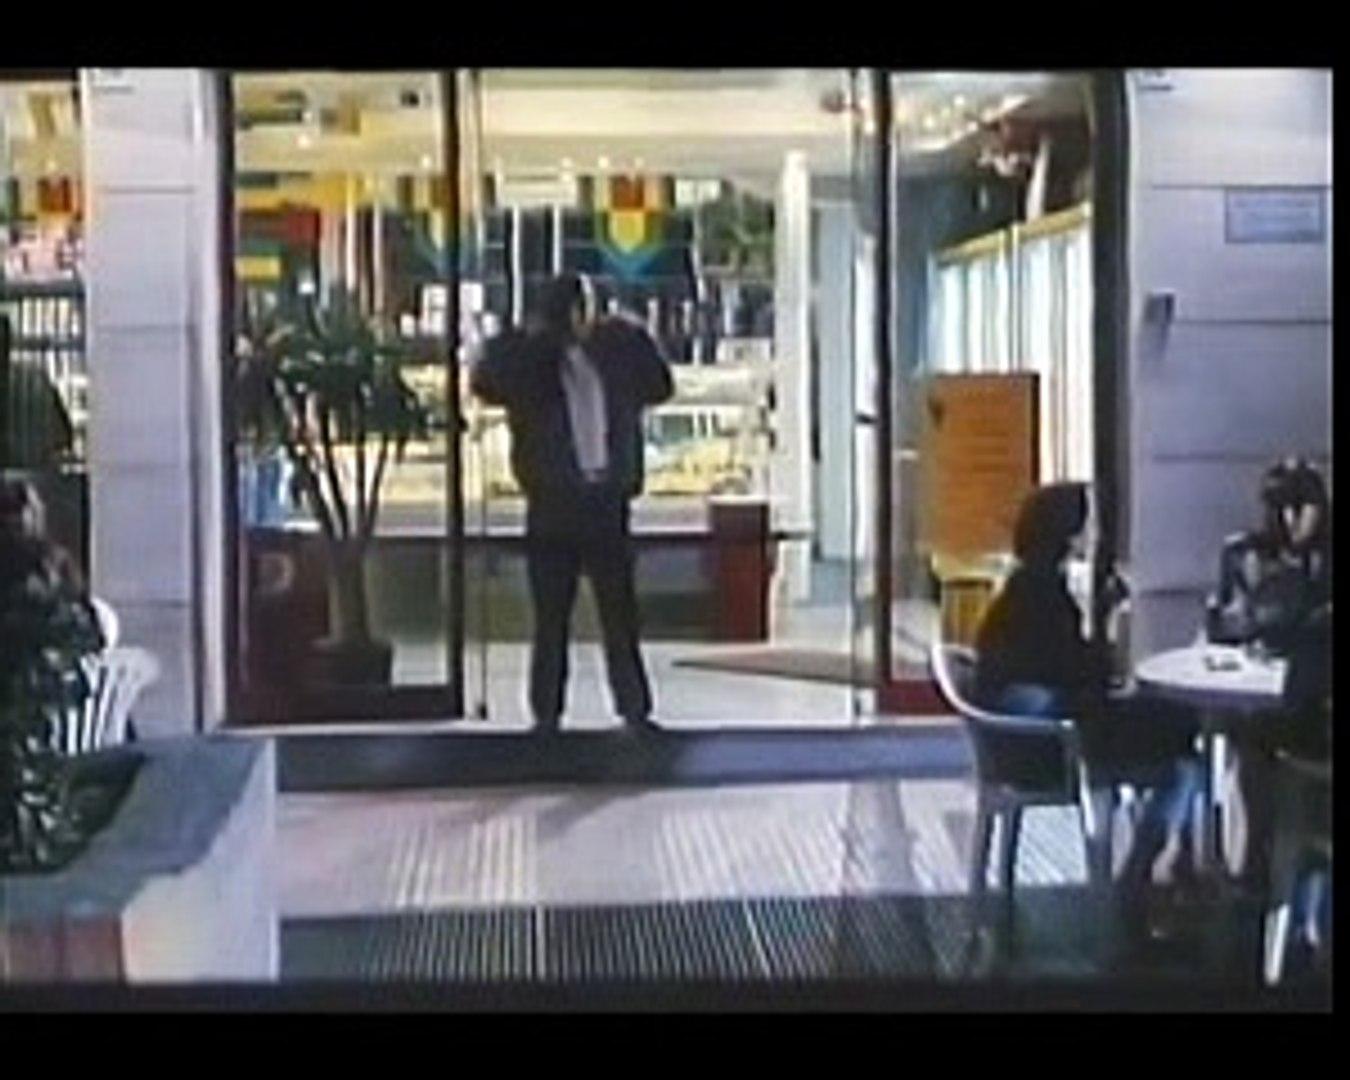 VITE PERDUTE [1992]  - FILM COMPLETO - [2 Parte]